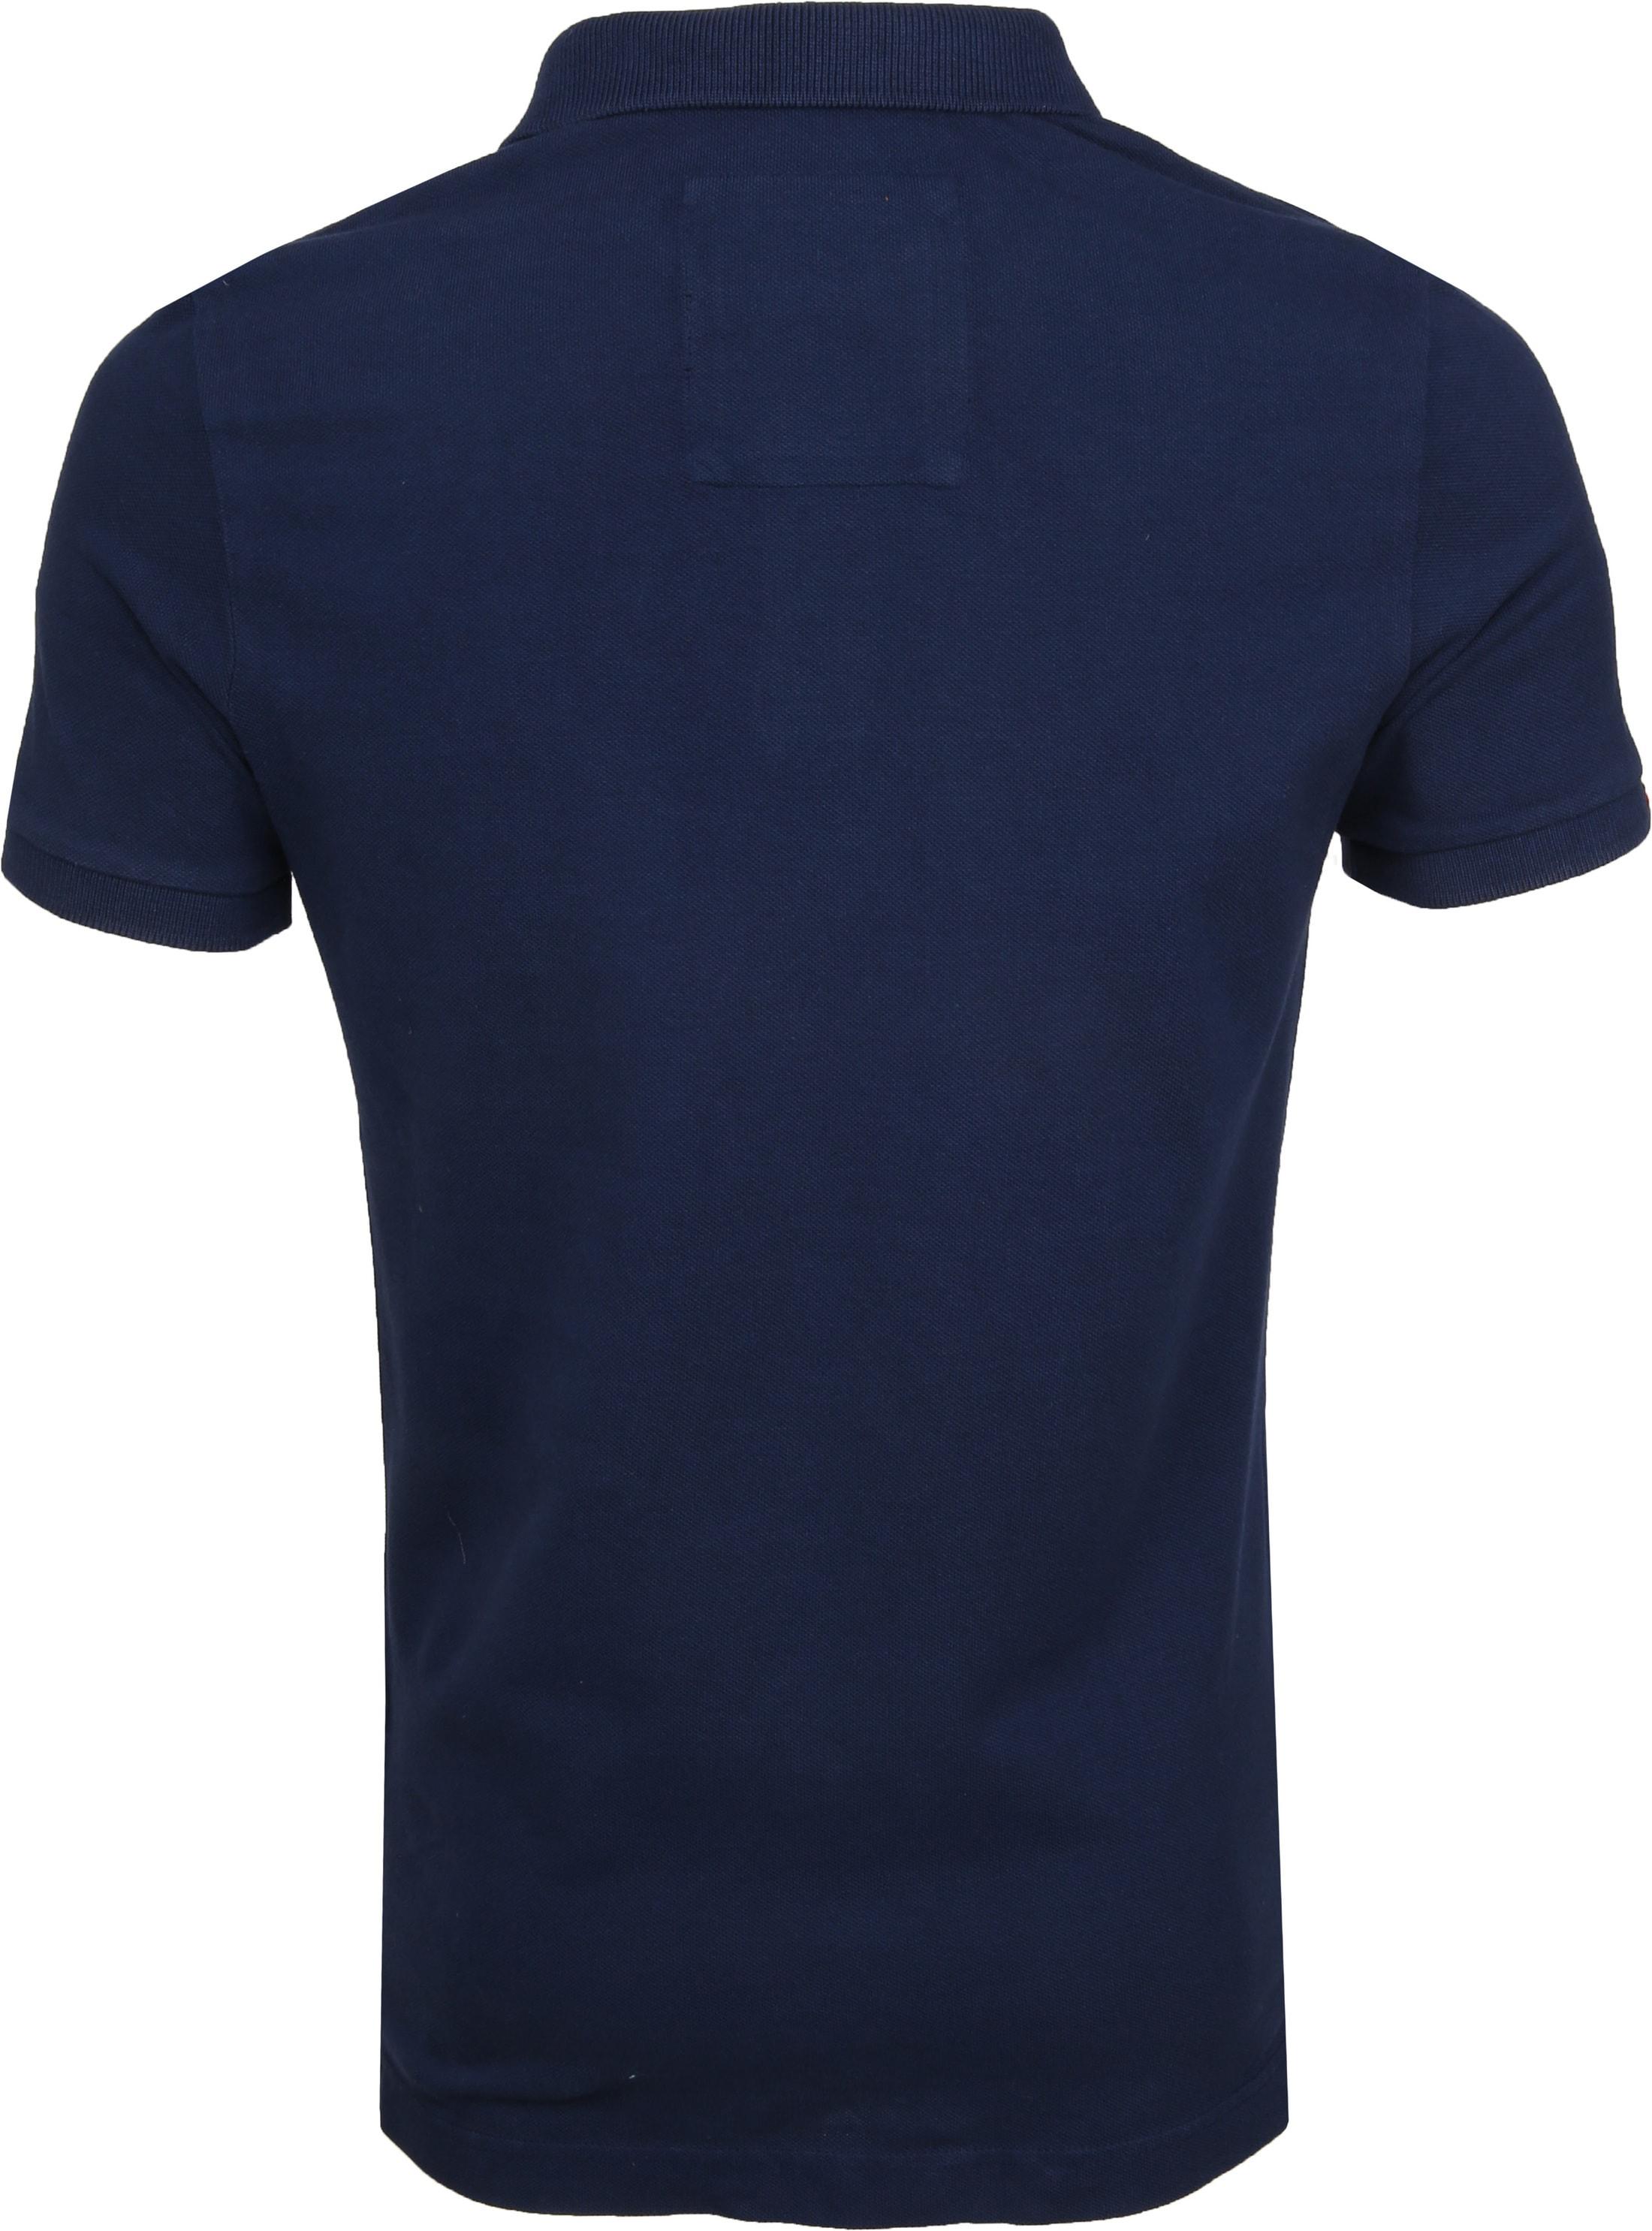 Superdry Premium Poloshirt Dunkelblau foto 4